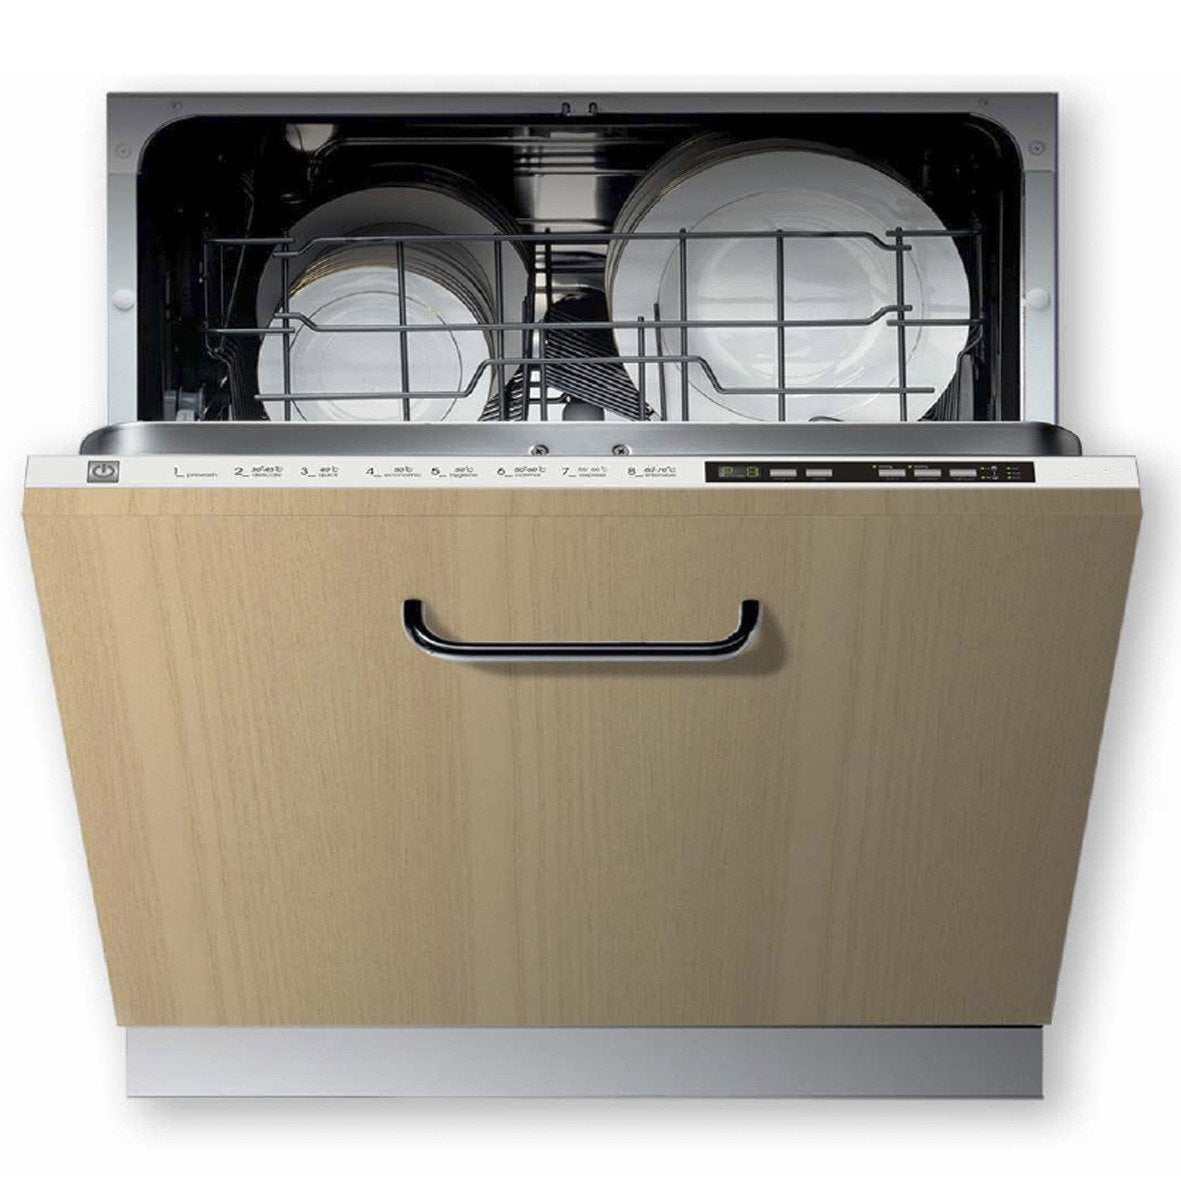 lave vaisselle int grable cm frionor lvtifri 12 couverts leroy merlin. Black Bedroom Furniture Sets. Home Design Ideas